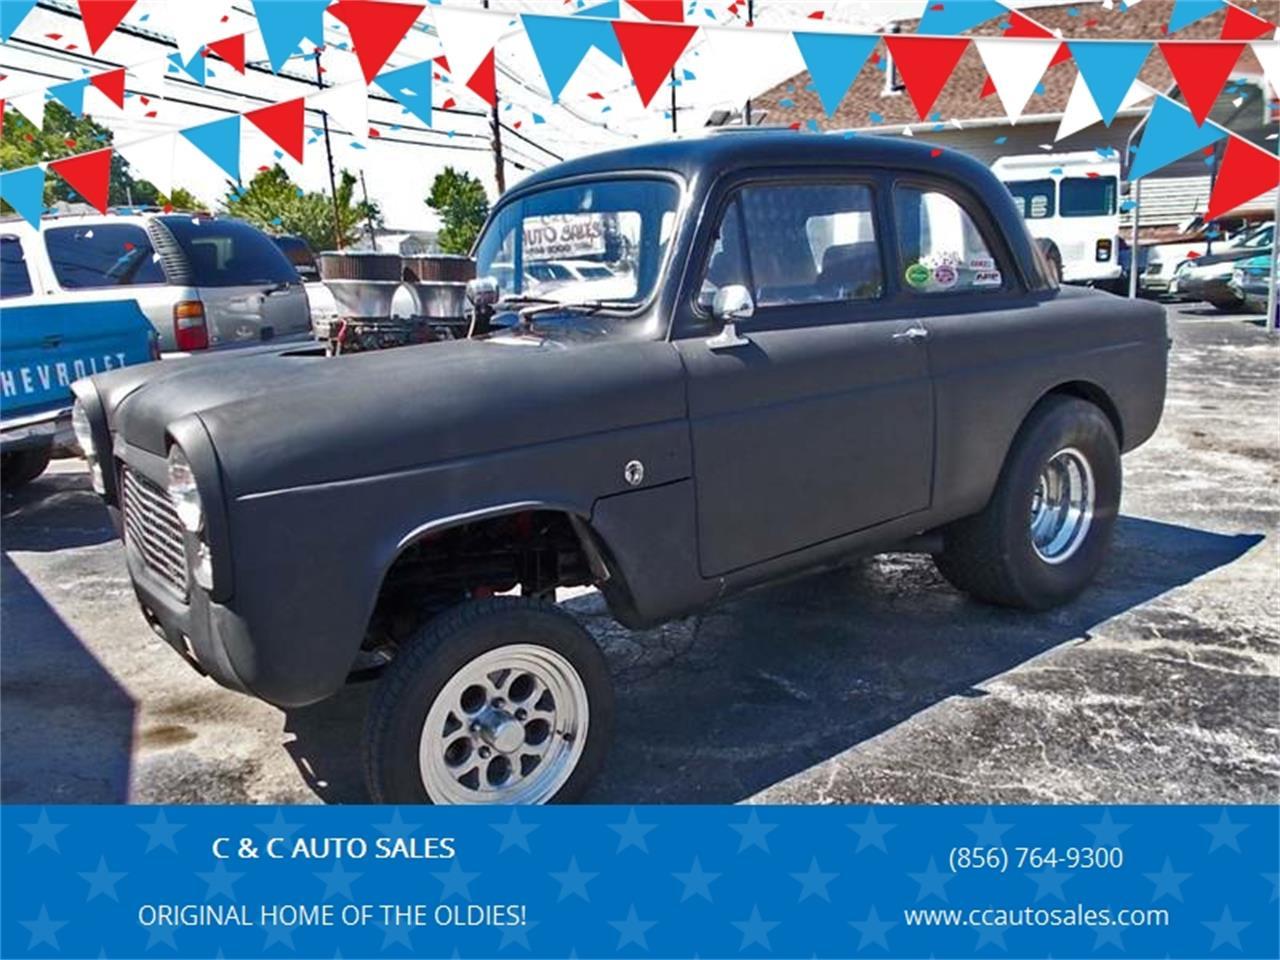 1959 Ford Anglia For Sale Classiccars Com Cc 1129456